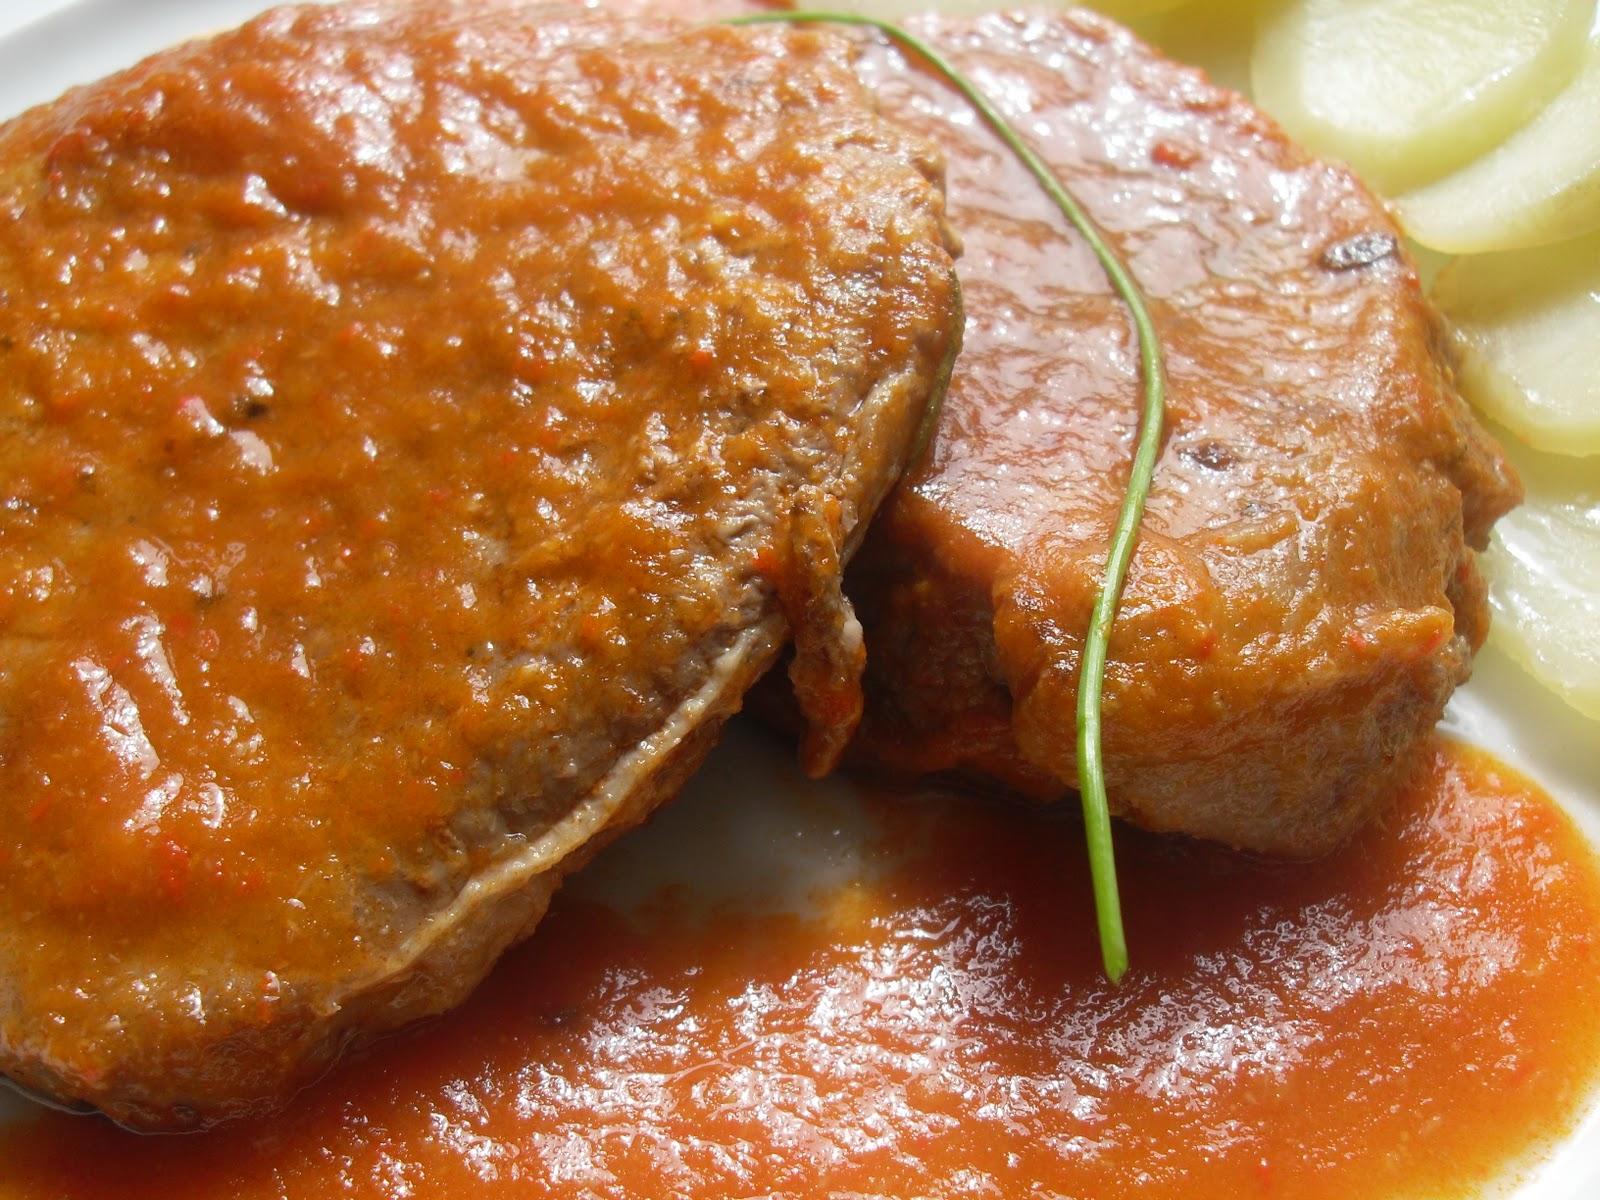 Recetas de la dieta dukan filetes de ternera en salsa - Filetes de ternera en salsa de cebolla ...